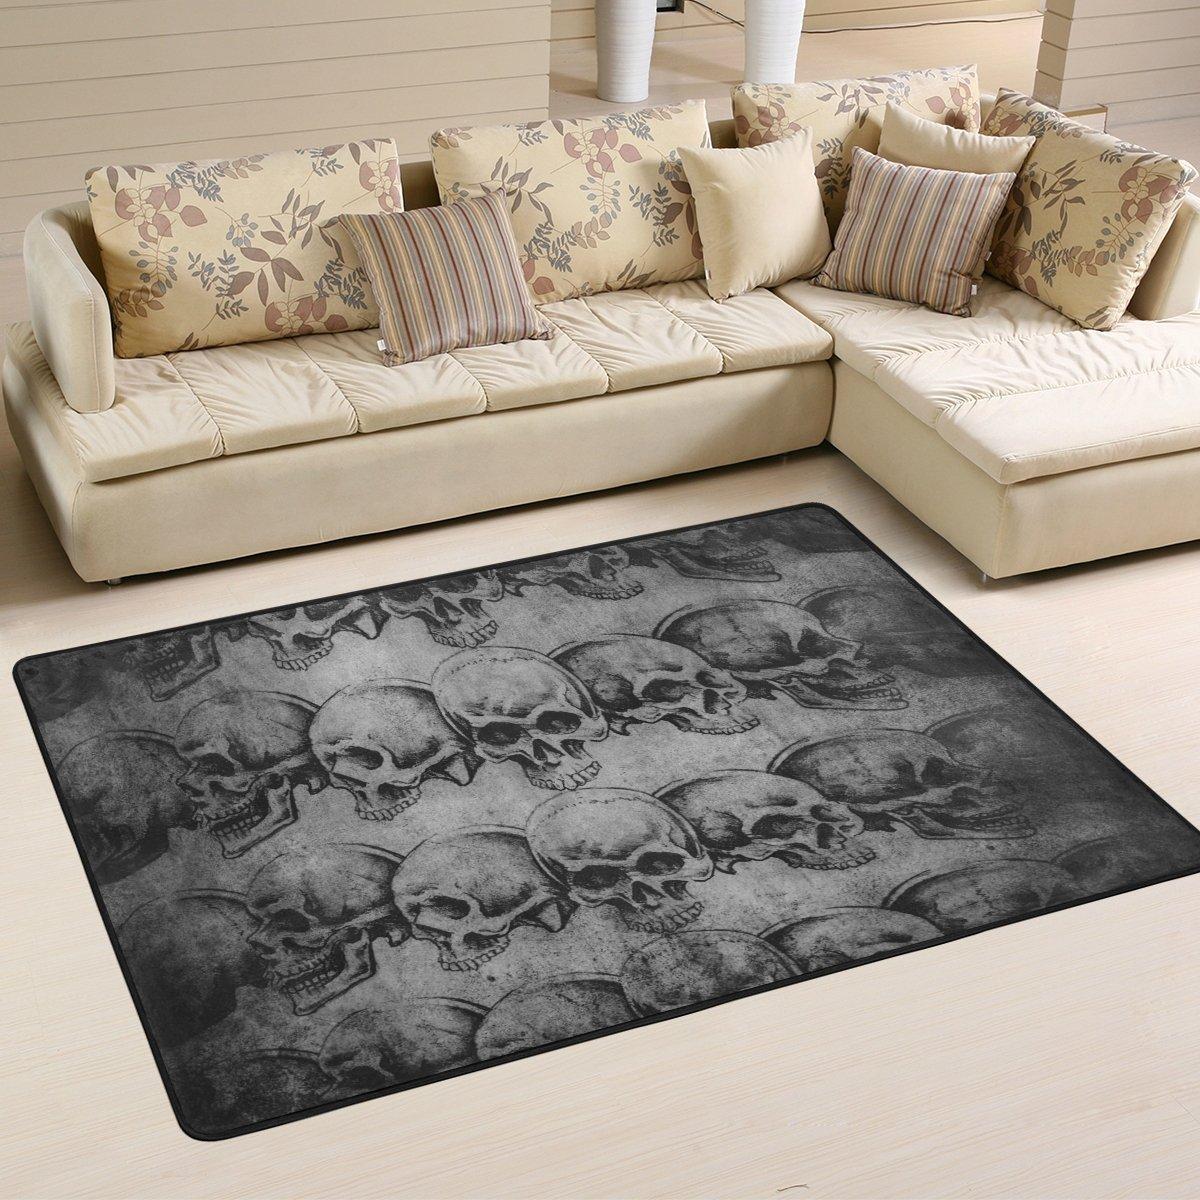 Naanle Sugar Skull Area Rug 4 x6 , Vintage Polyester Area Rug Mat for Living Dining Dorm Room Bedroom Home Decorative